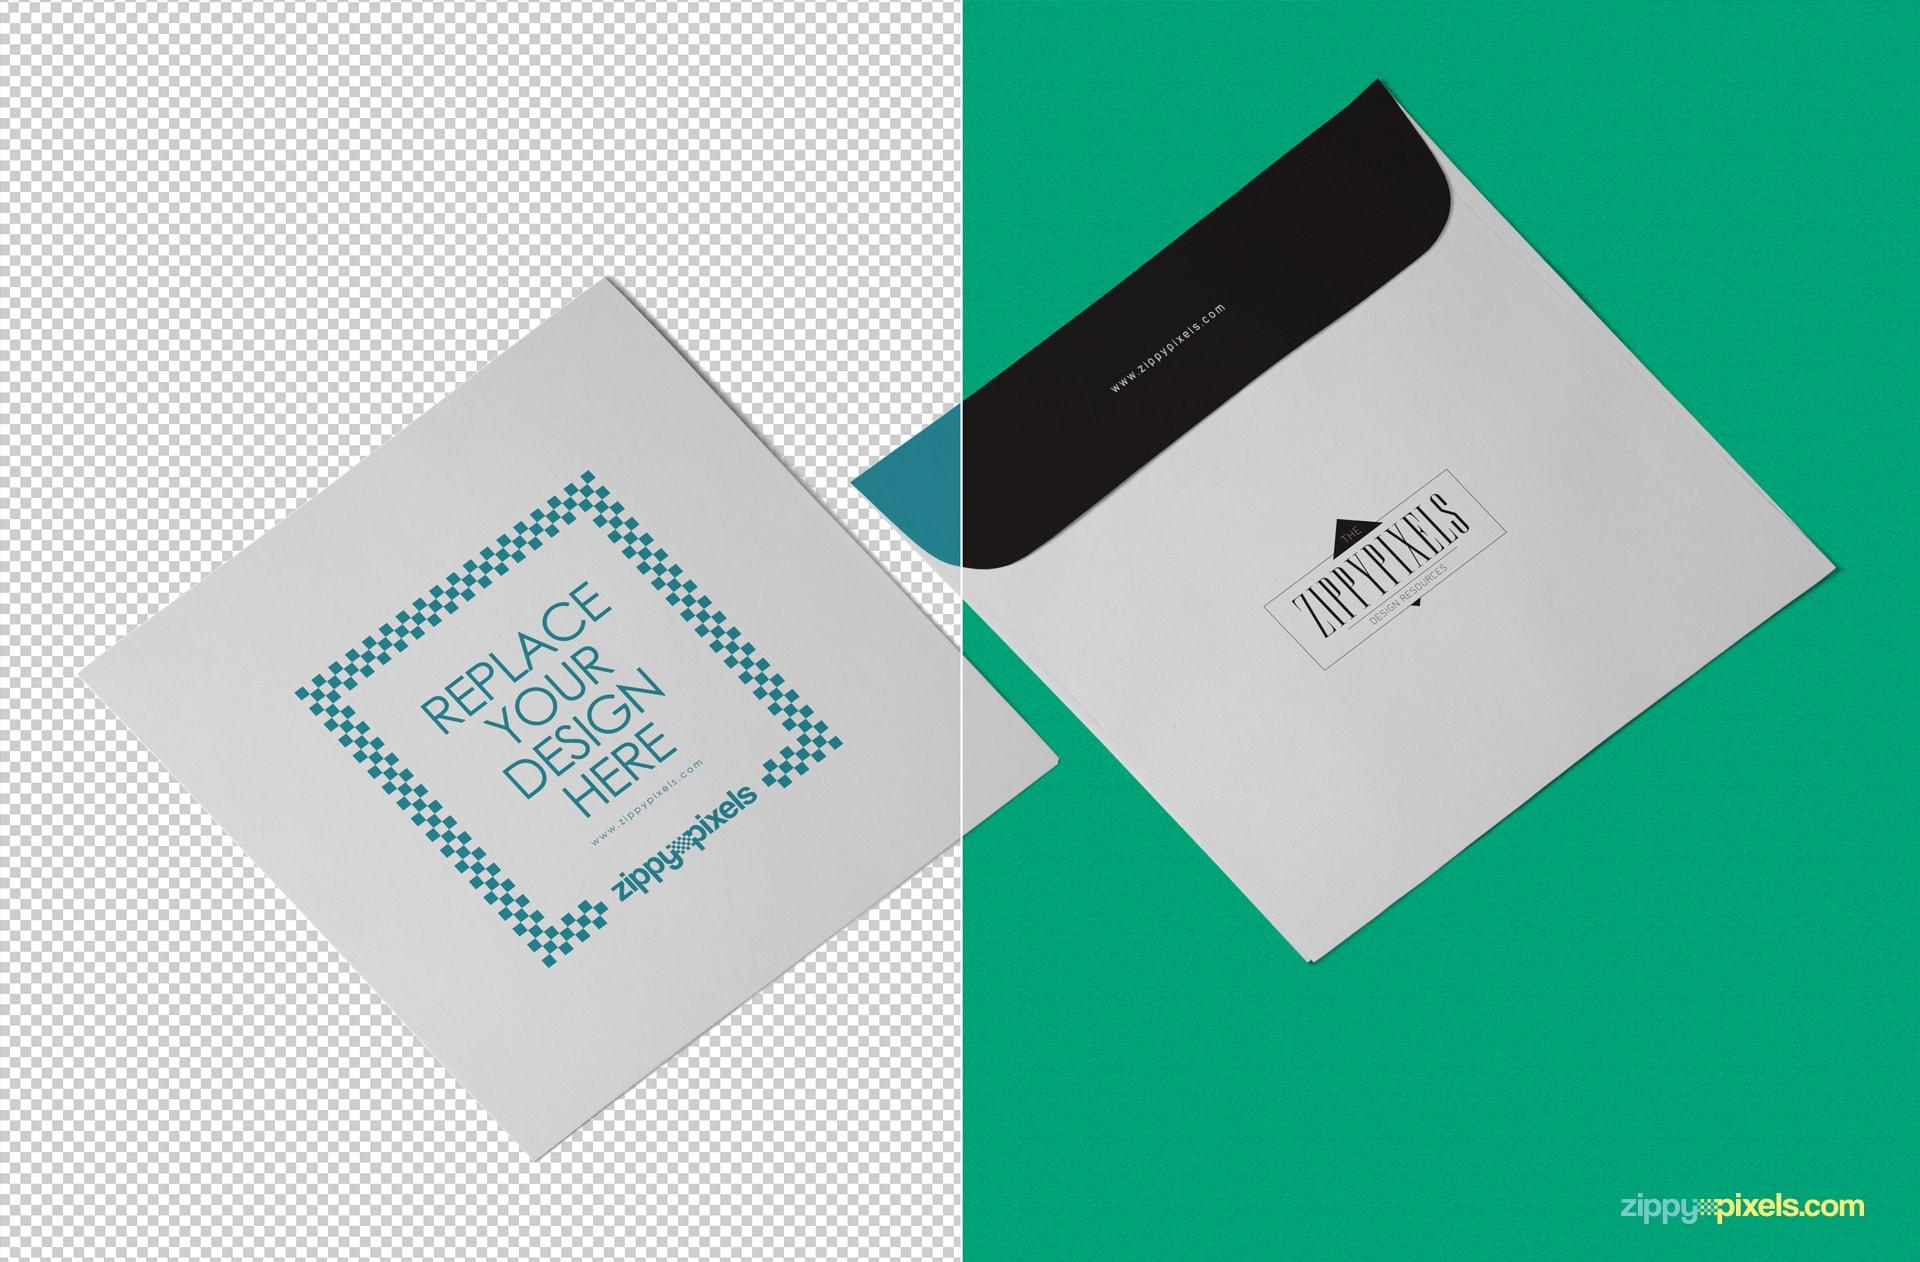 editable envelope PSD mockup for showcasing your designs